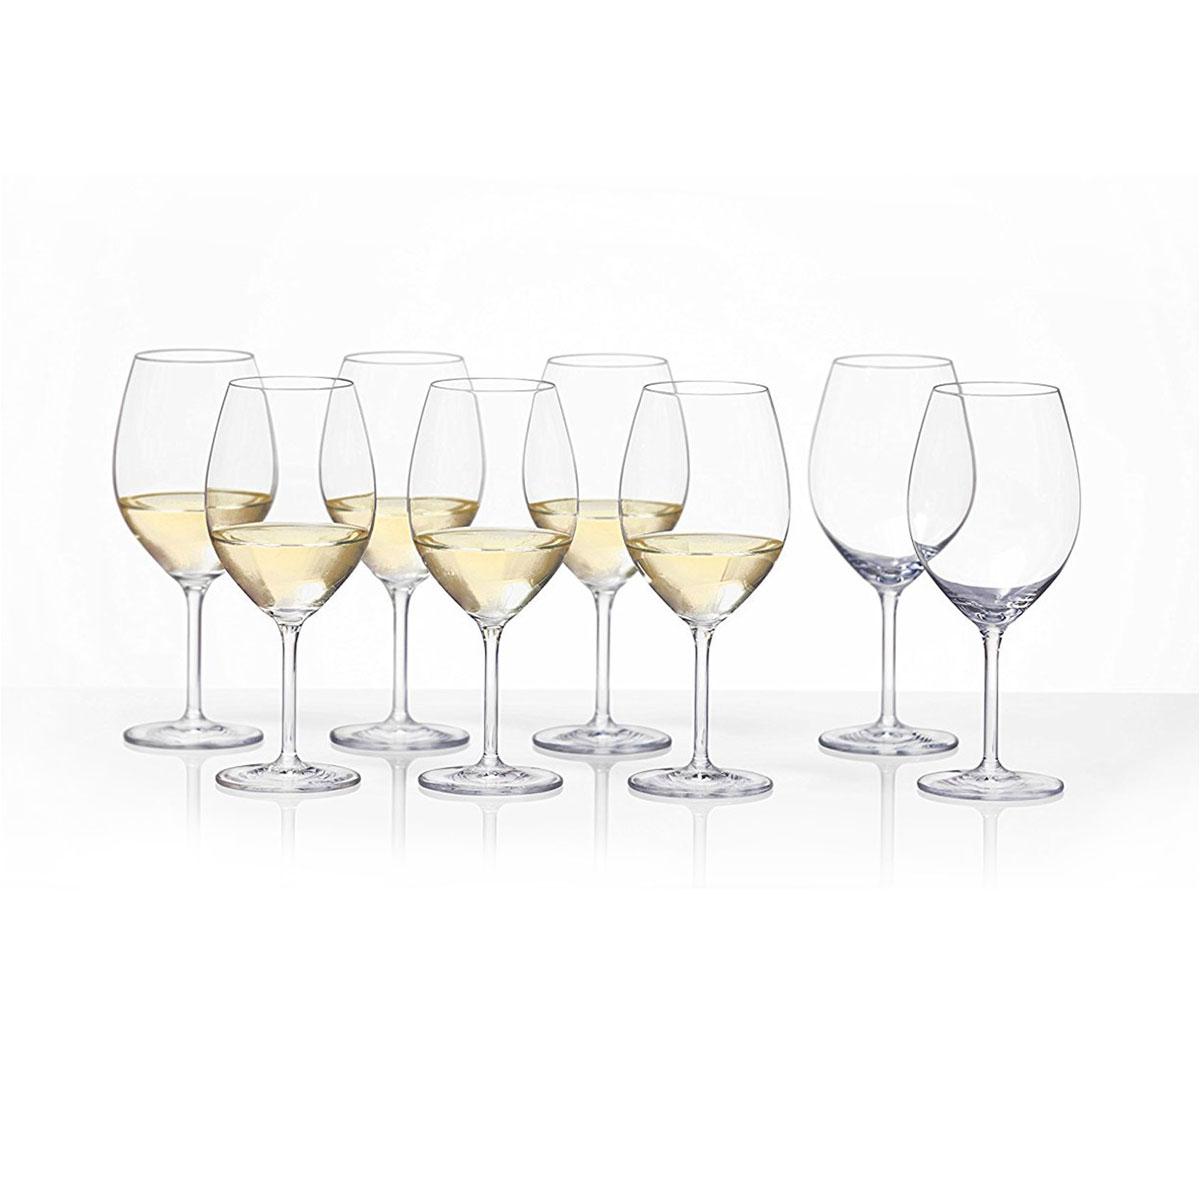 Schott Zwiesel Tritan Crystal Cru Classic Full White Wine Set 6 2 Free Crystal Classics